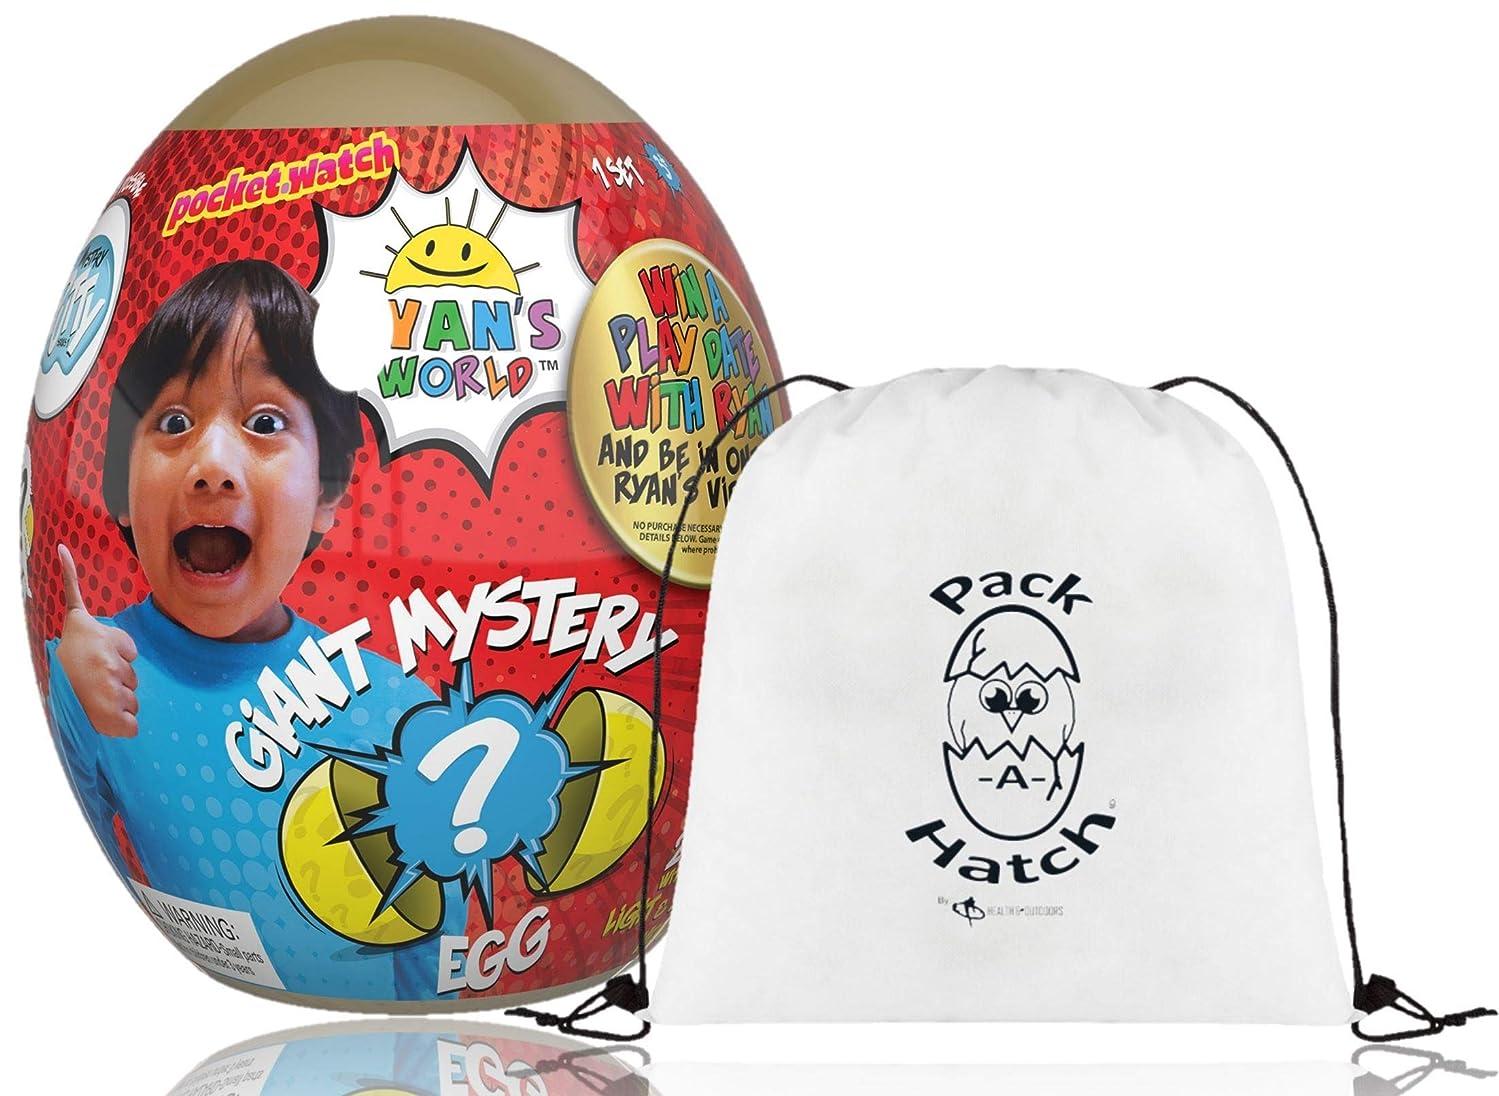 Ryan's World Gold Egg W/ Pack A Hatch